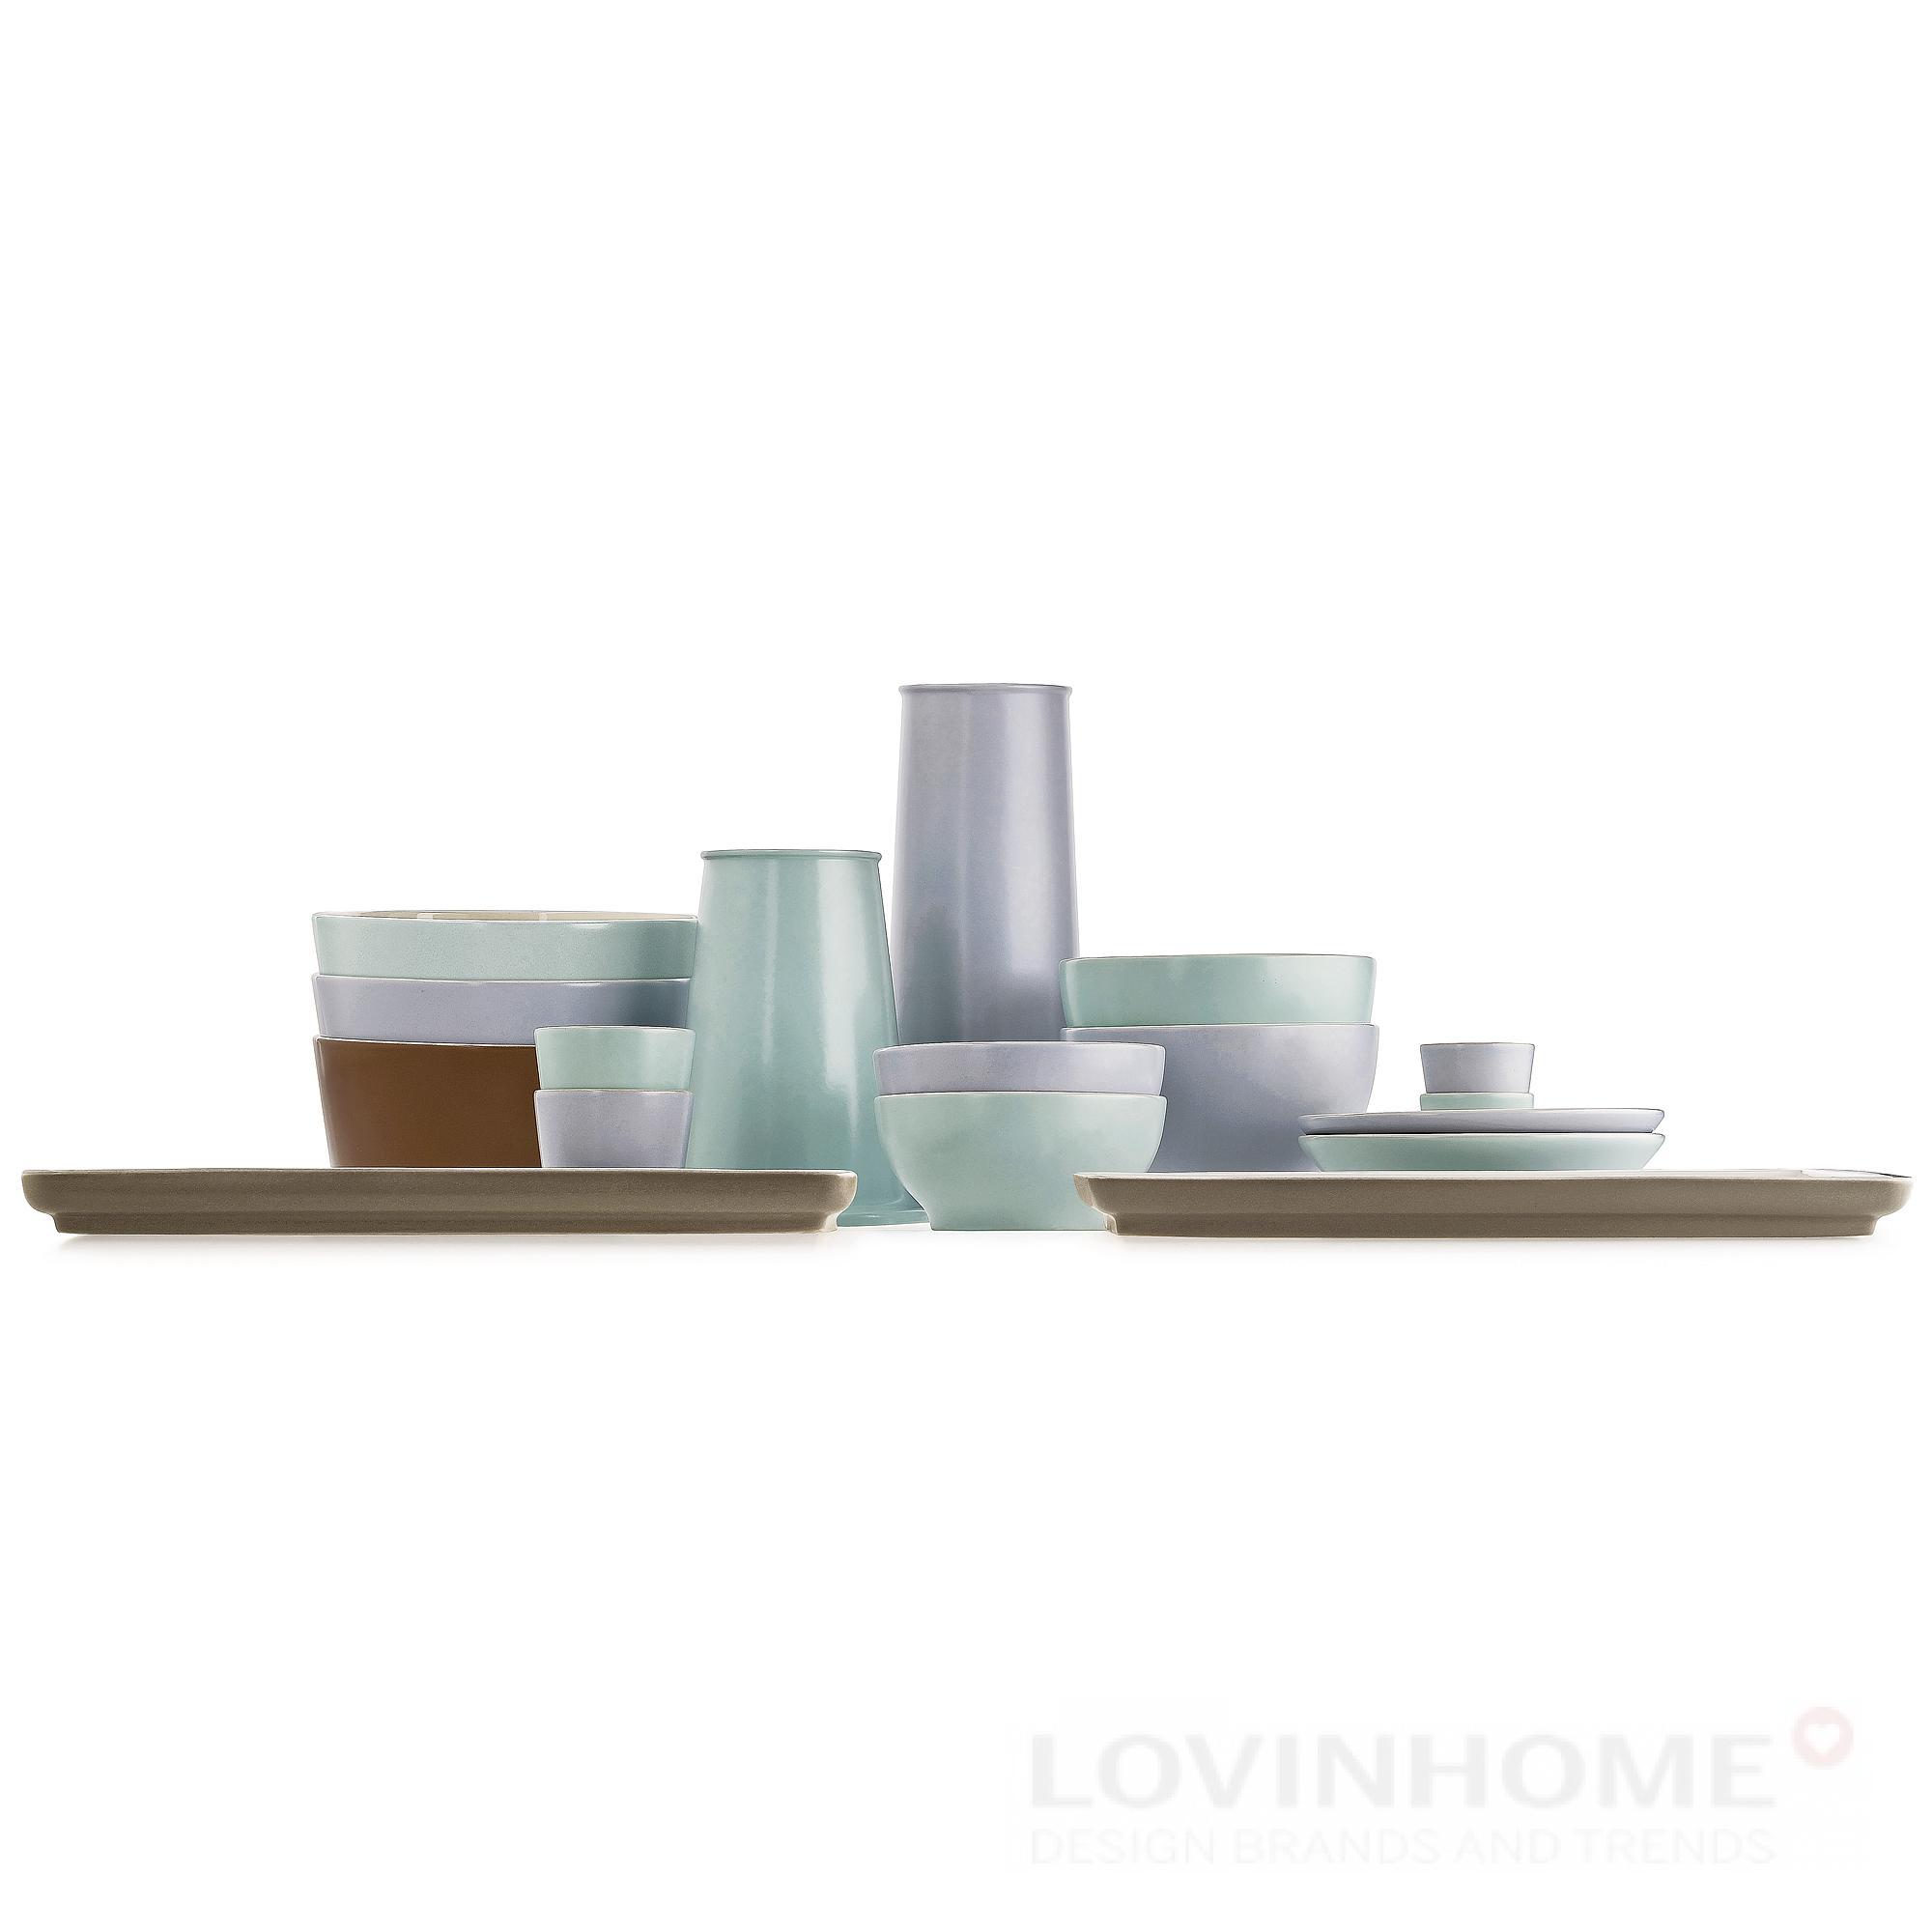 alessi tonale schale klein pale green. Black Bedroom Furniture Sets. Home Design Ideas